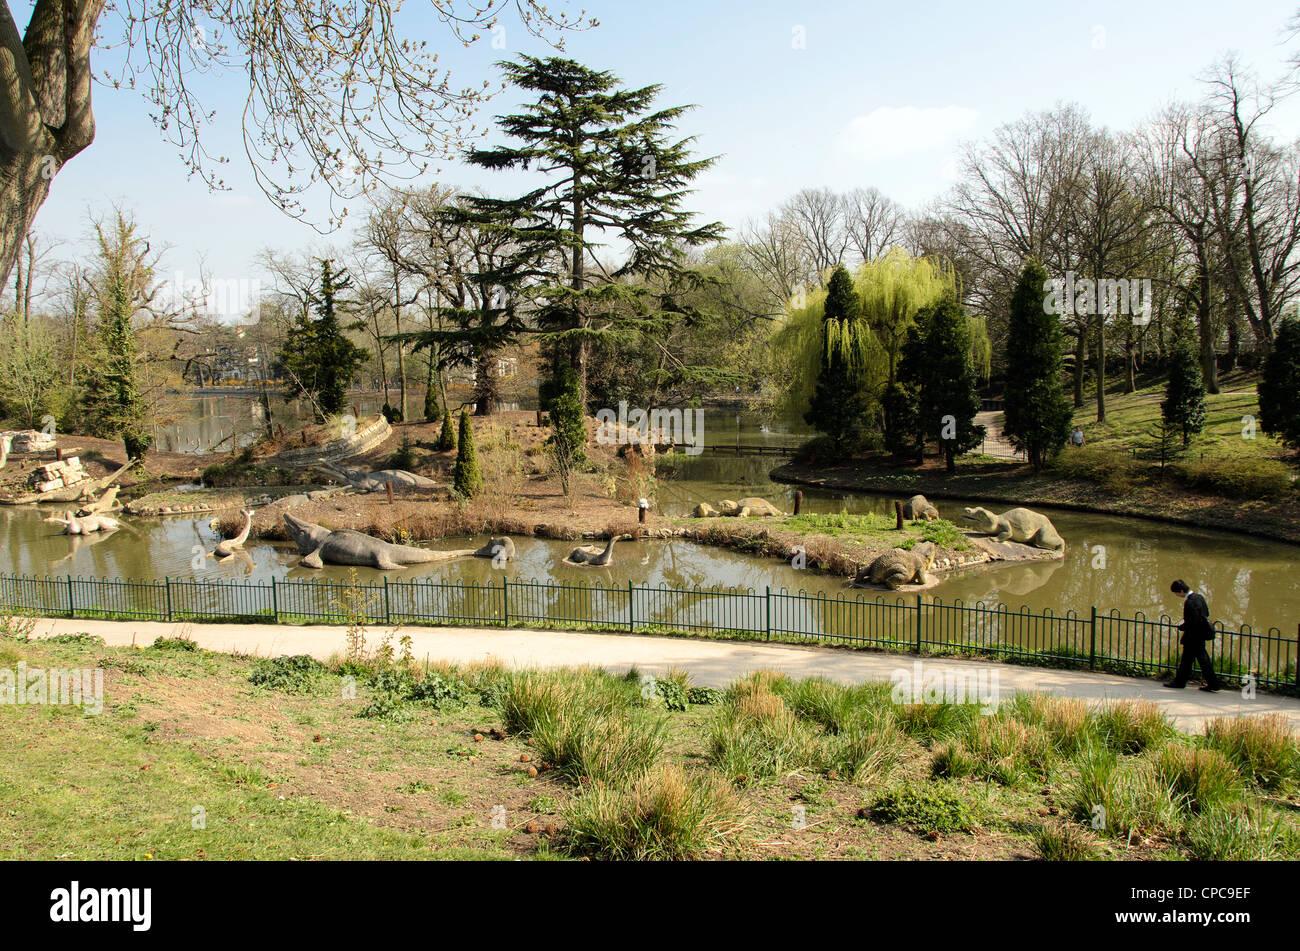 Crystal Palace Parks prehistoric monster trail - Sydenham, London - England - Stock Image